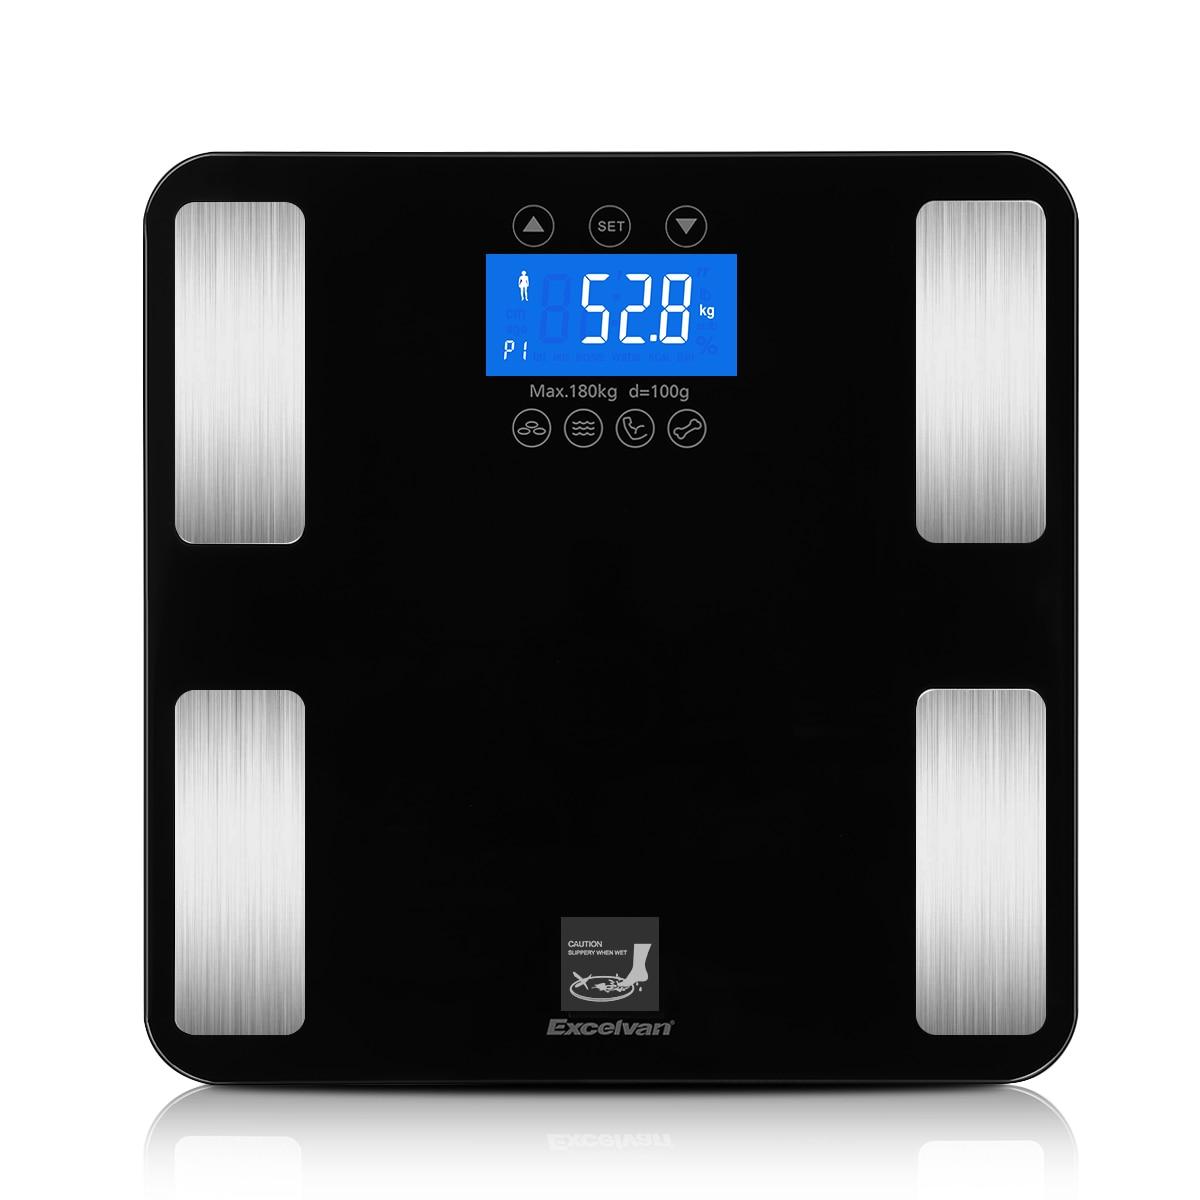 Excelvan-báscula Digital inteligente táctil, báscula de 400lb/0,1 kg para peso corporal, BMI, agua grasa, calorías, hueso y músculo, baño de masa